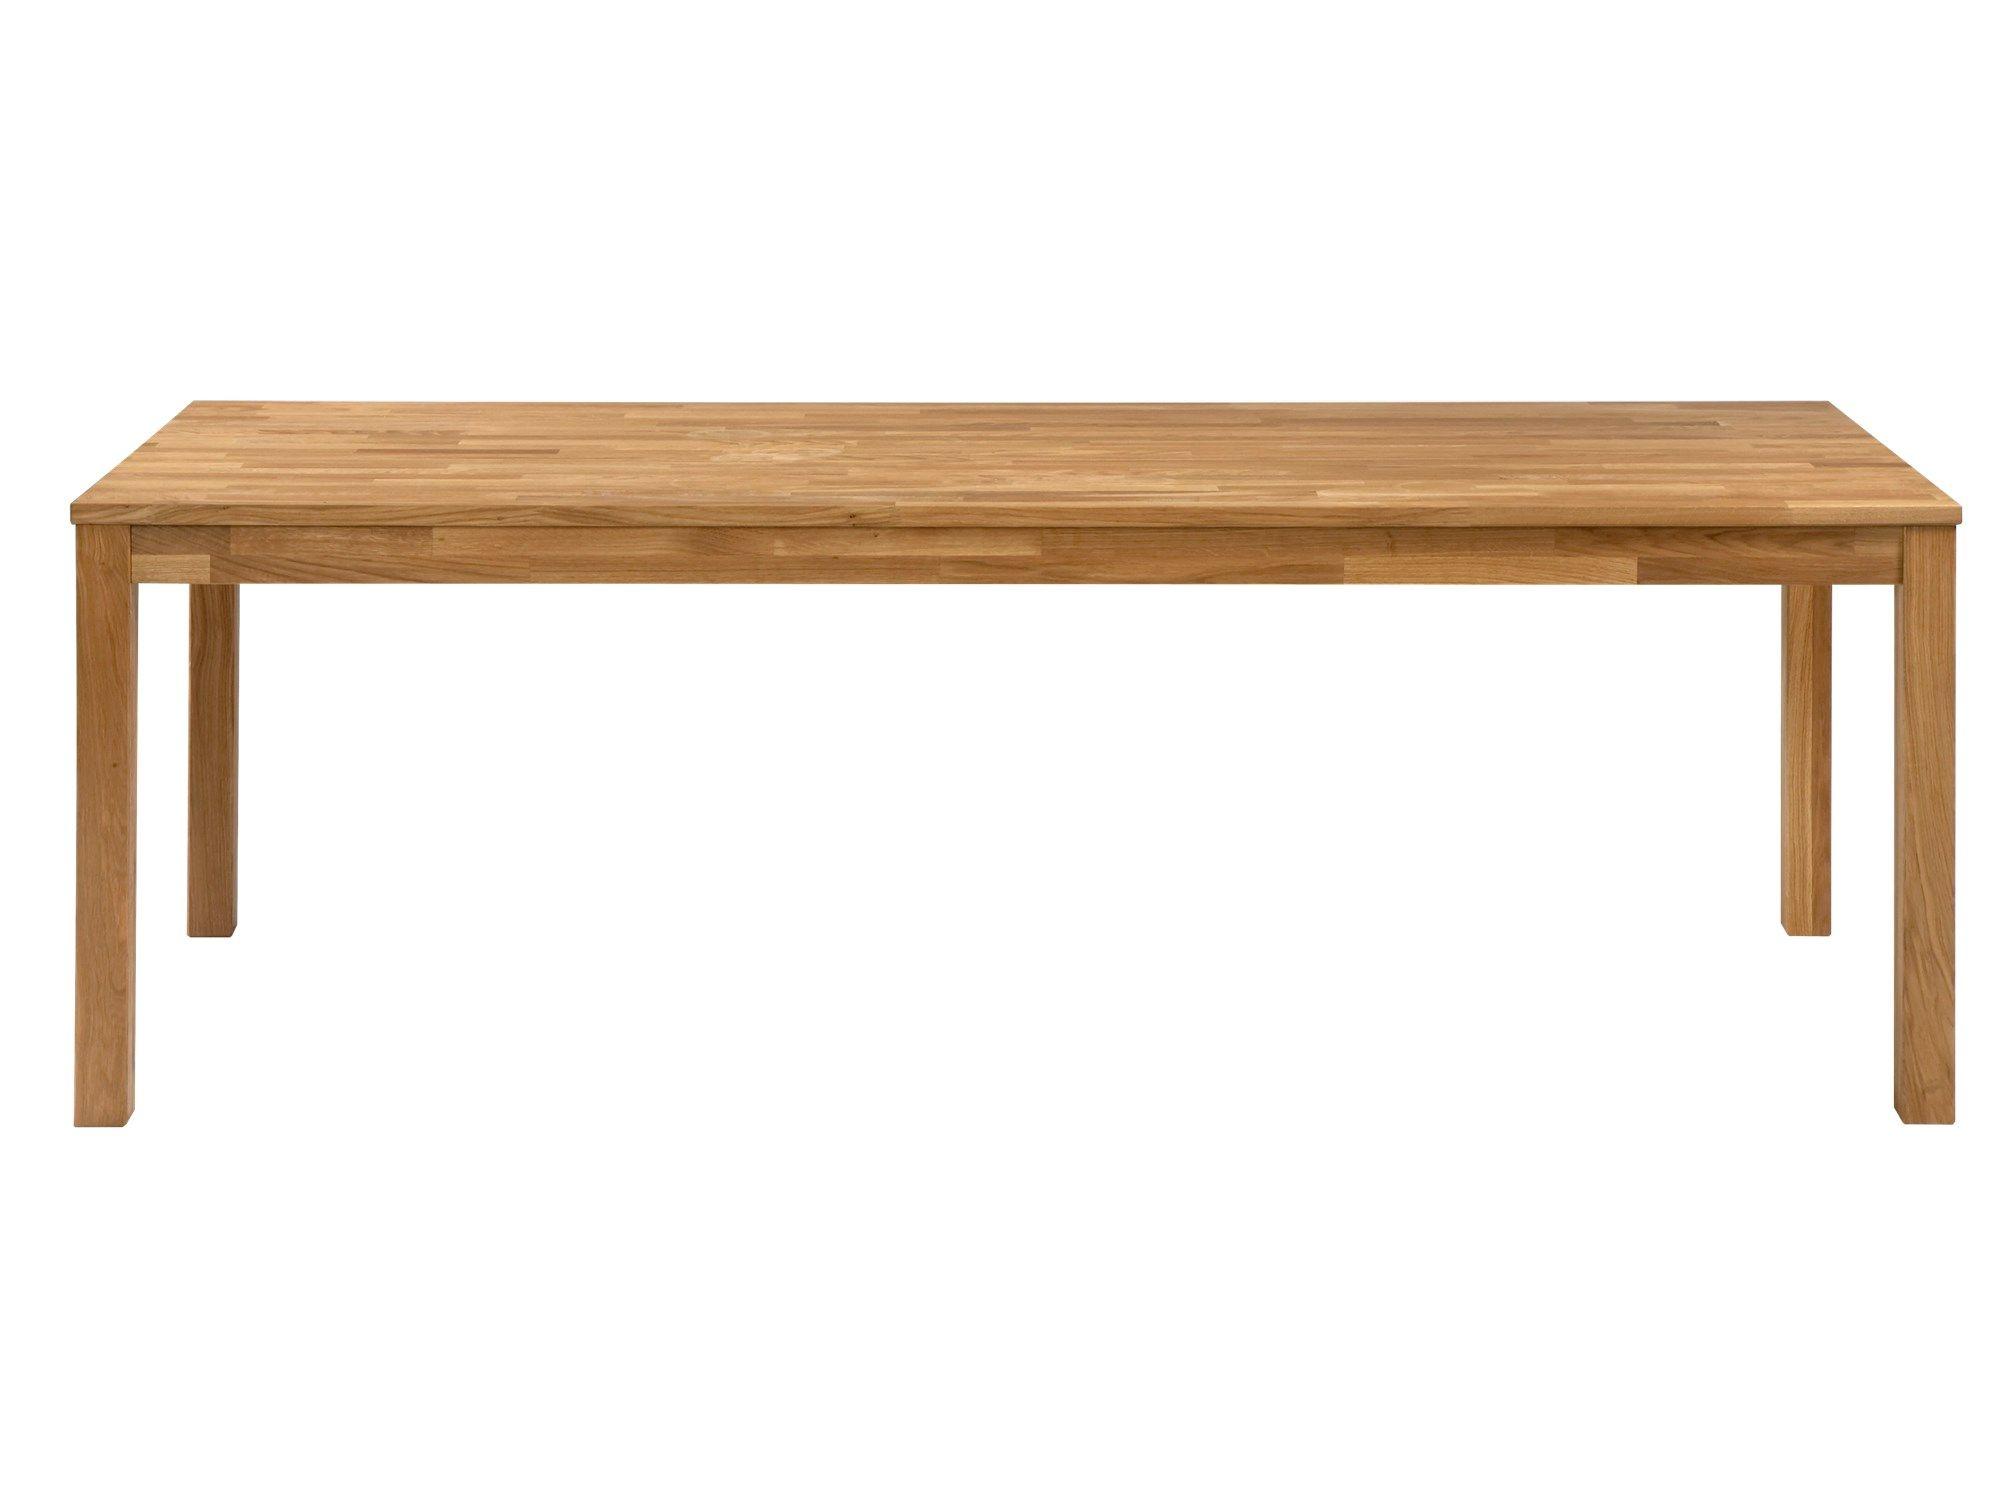 Skagen Spisebord 90x240 Cm Scandinavian Design Spisebord Design